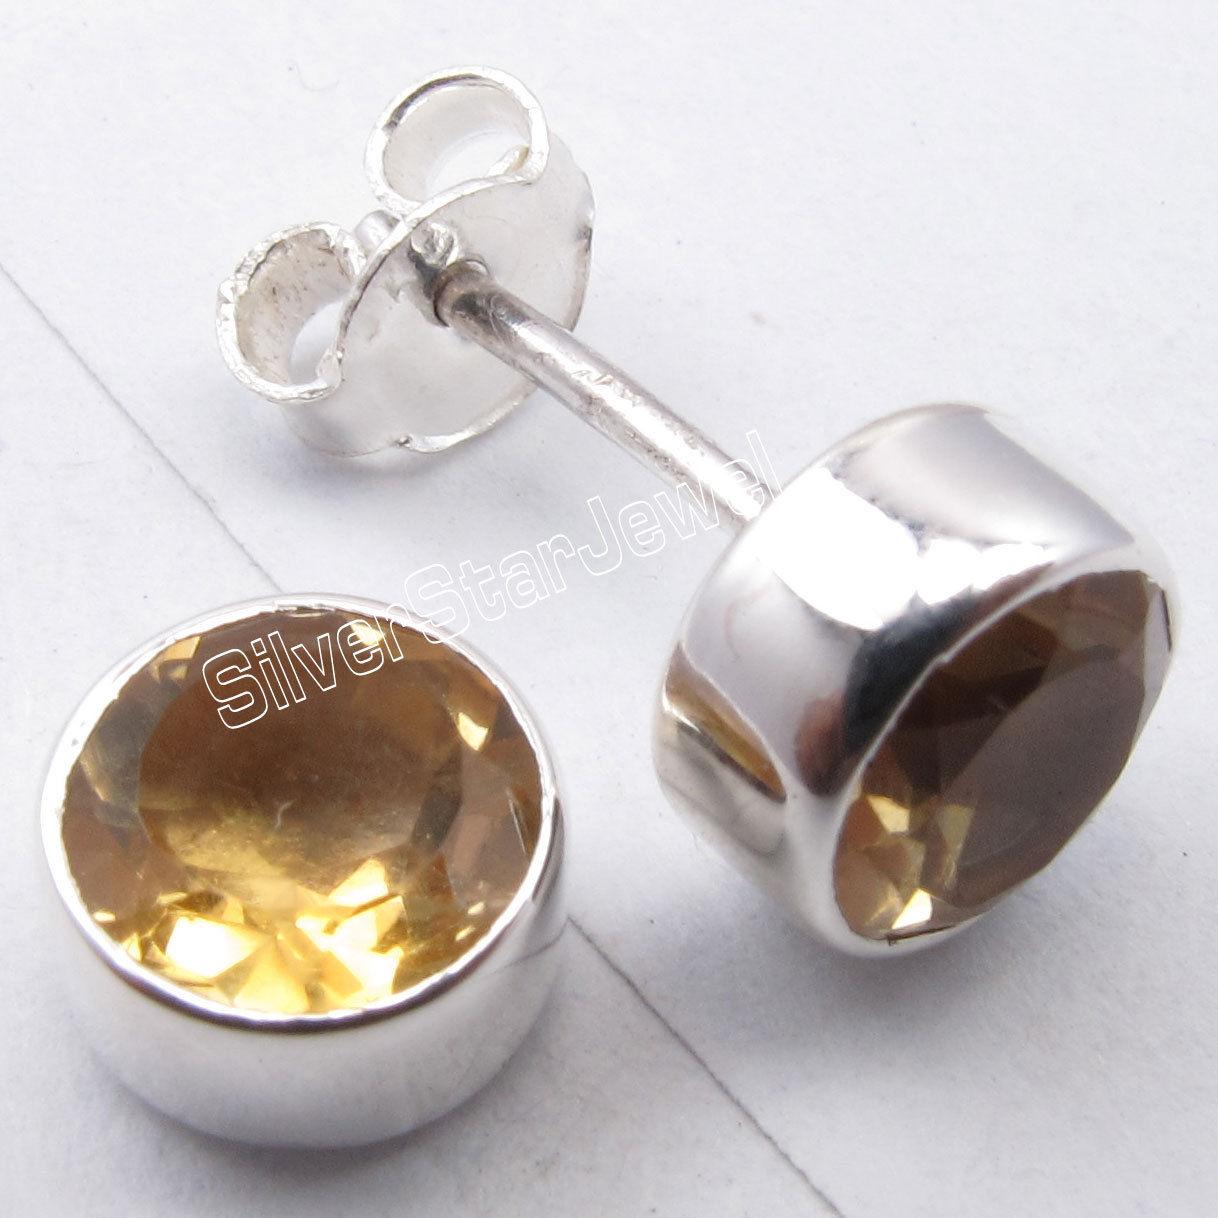 все цены на Chanti International Silver Iolite, Amethysts, Labradorite & More Gem Variation Stud Earrings FINE EDH Variation онлайн